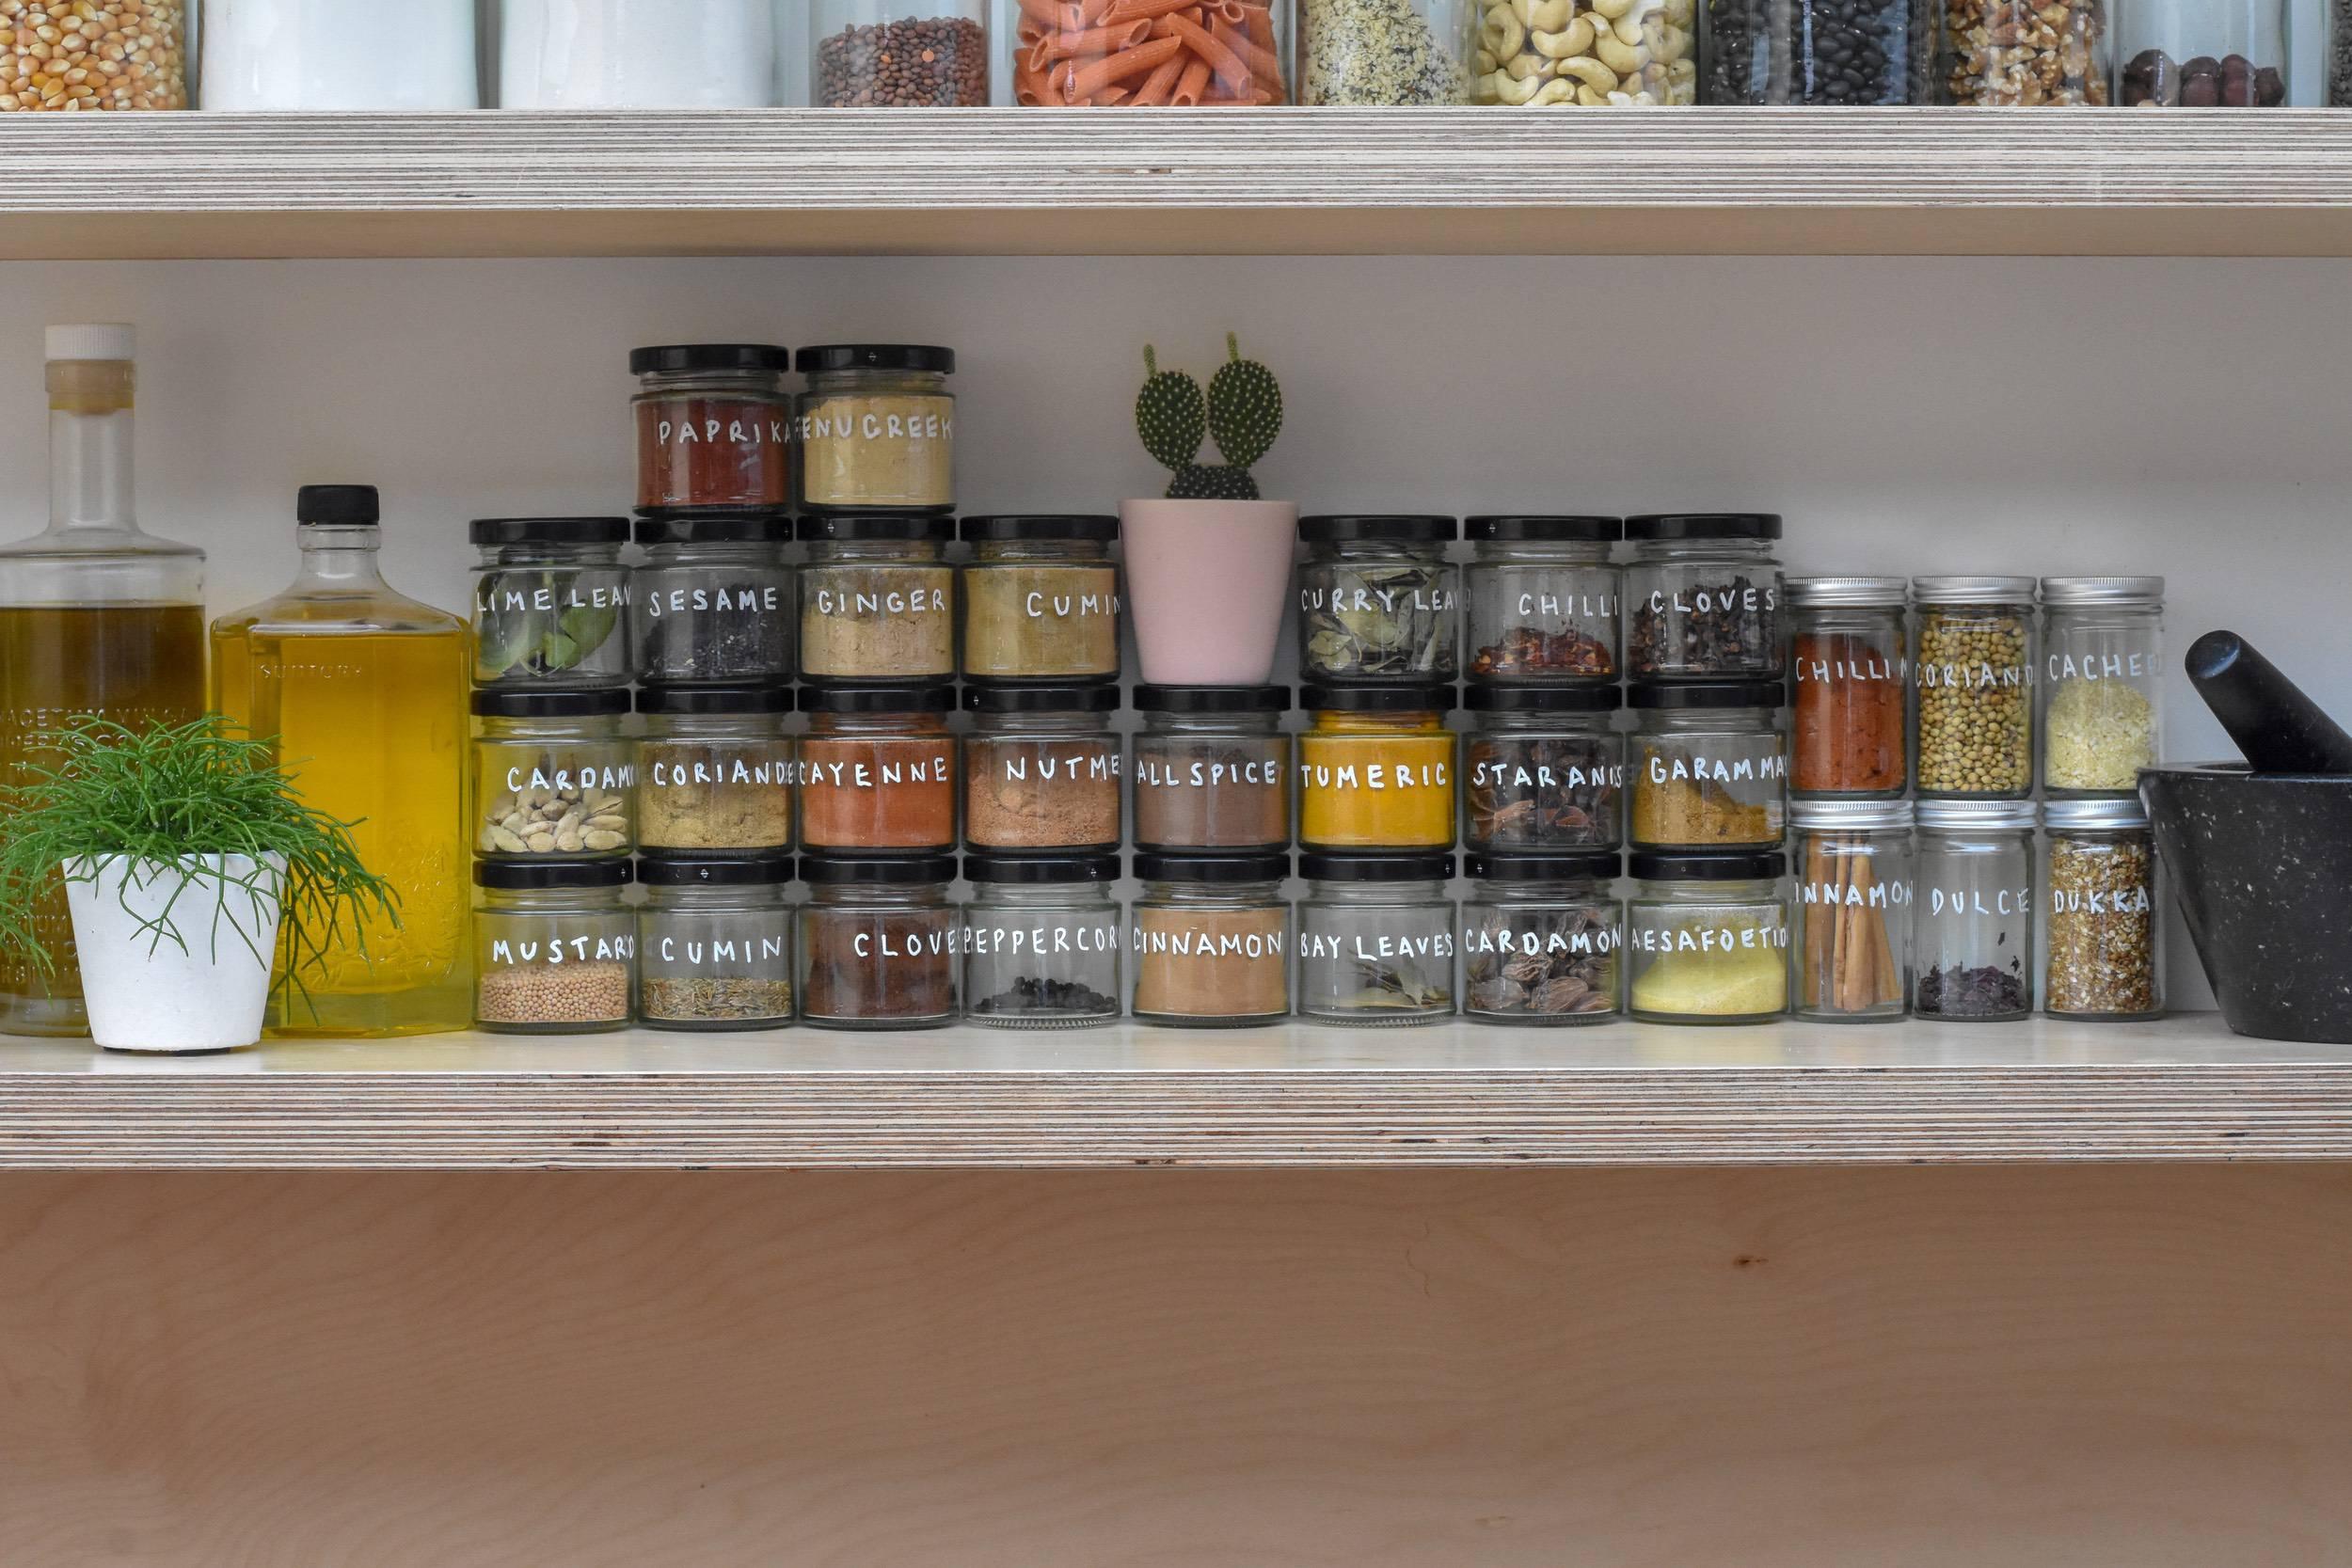 plastic-free-kitchen-spices